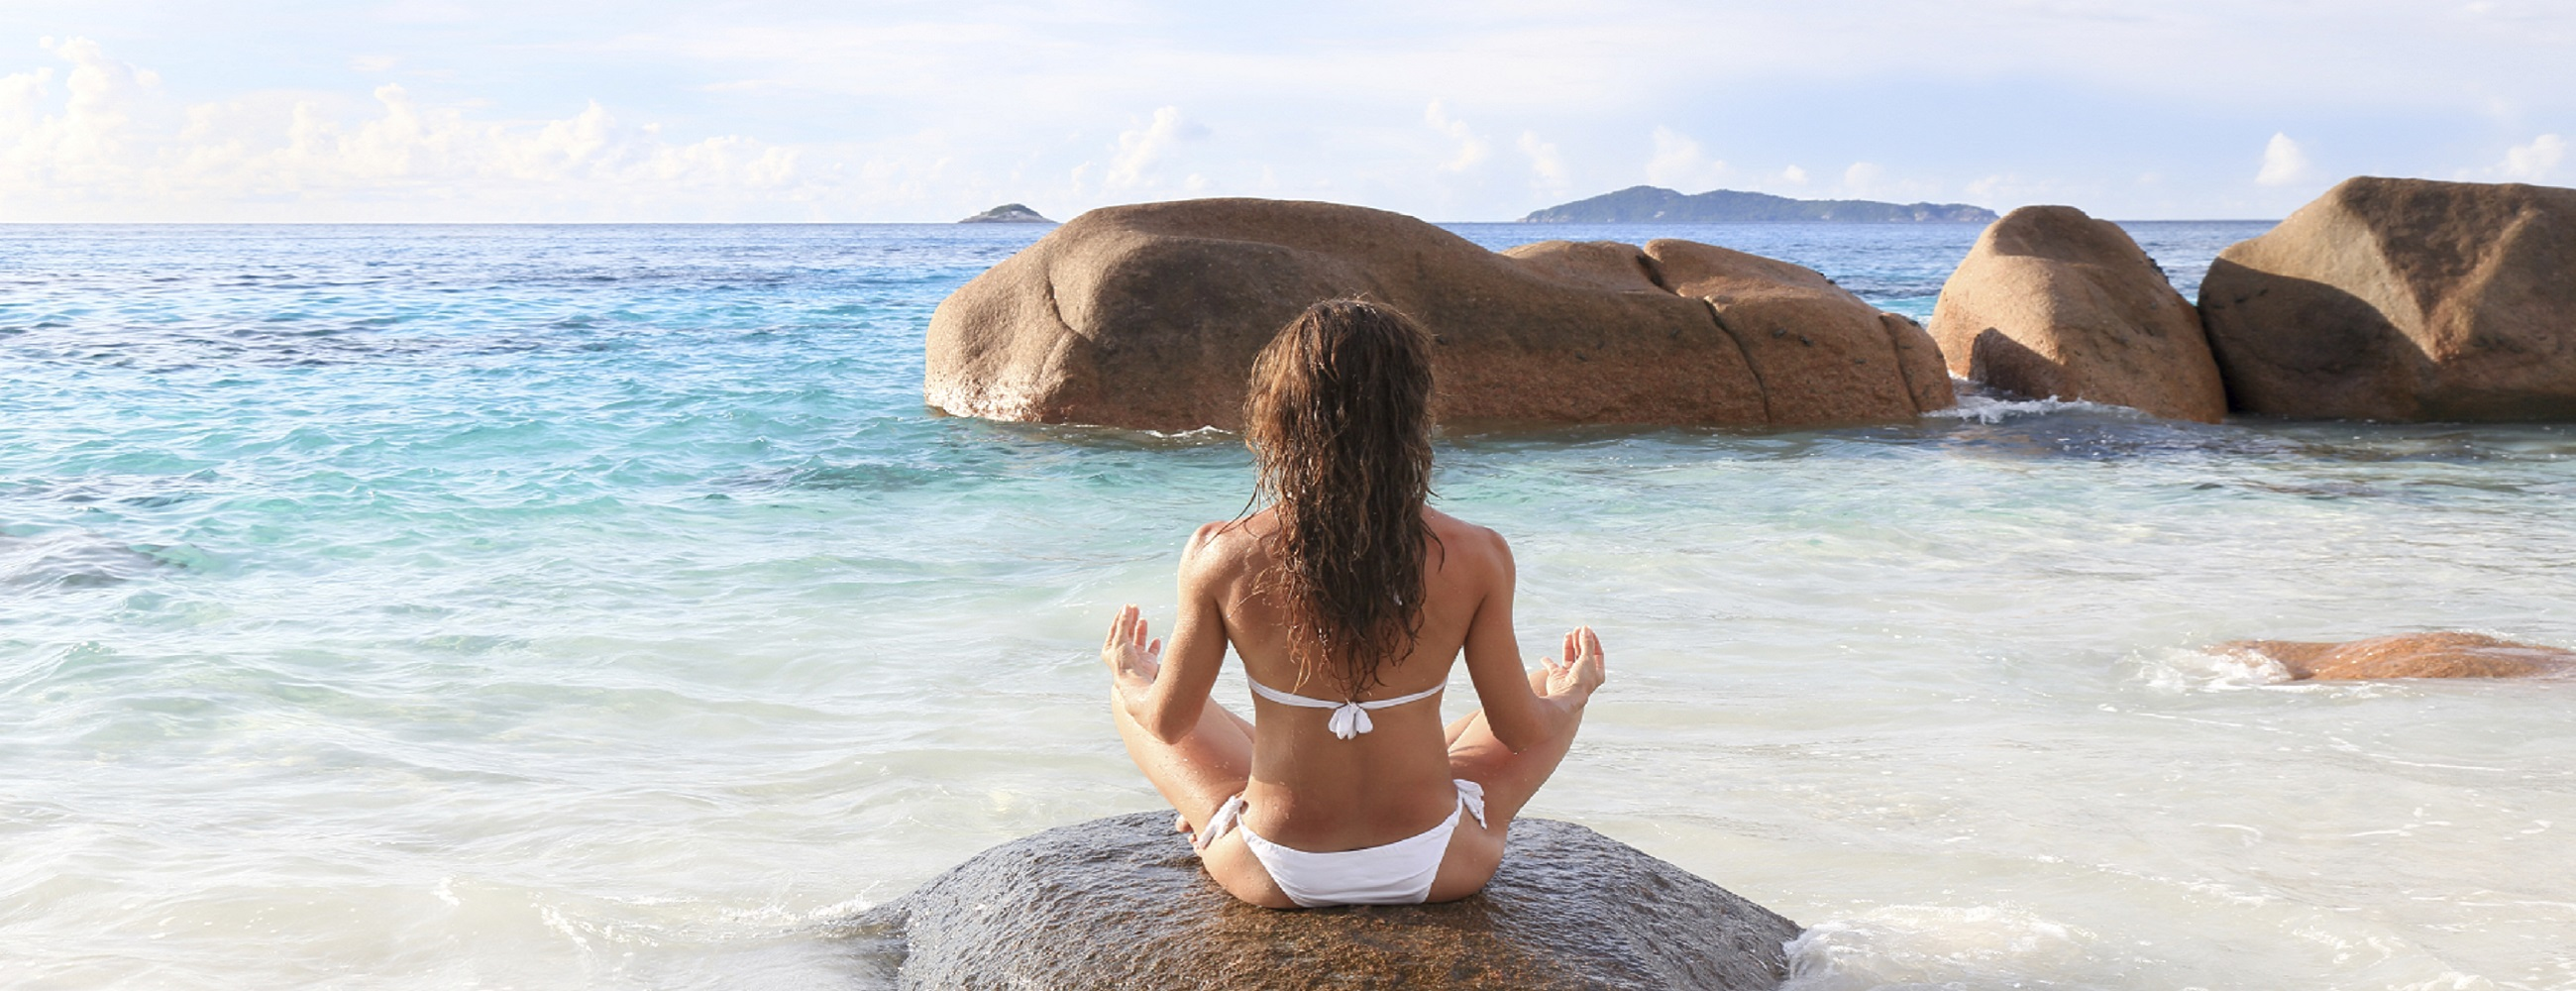 The Seychelles honeymoon destination